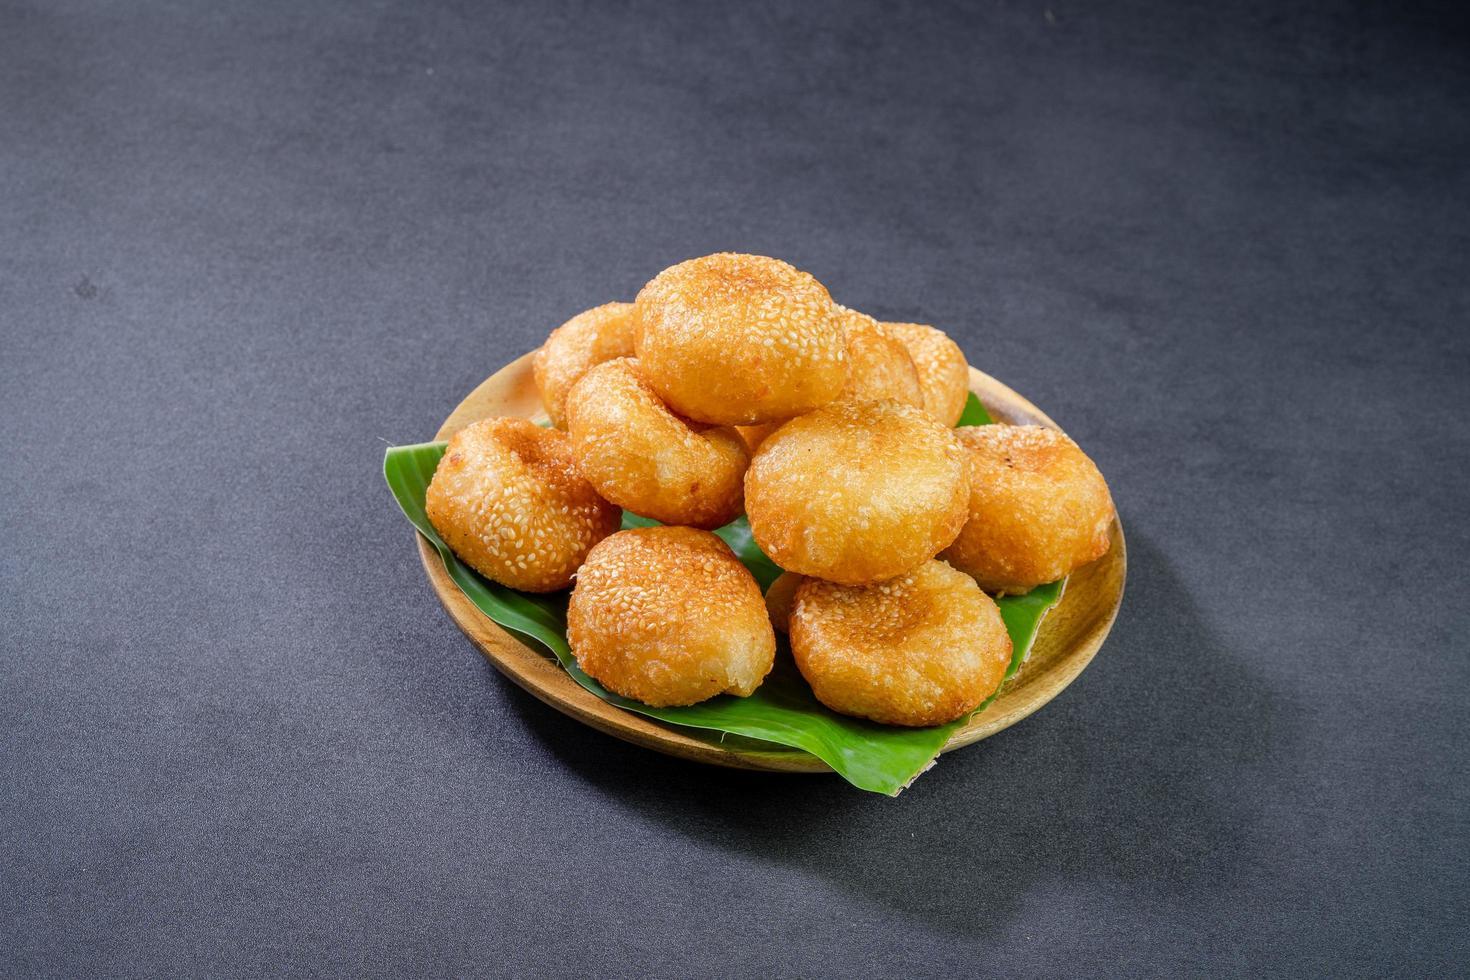 Vietnam doughnuts on plate photo